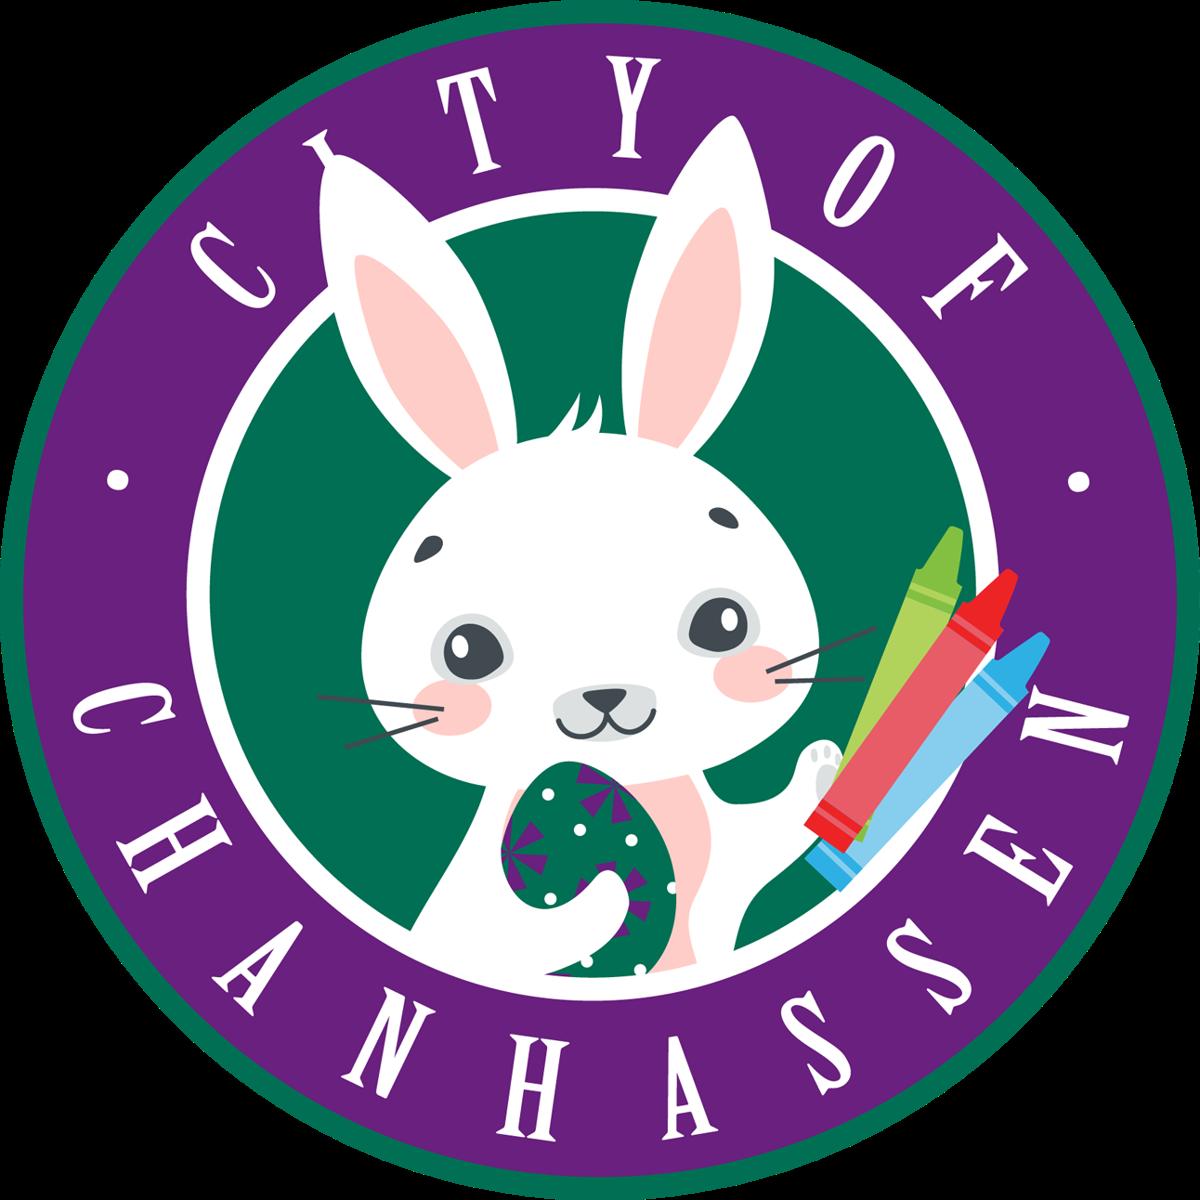 Chan Easter Bunny logo